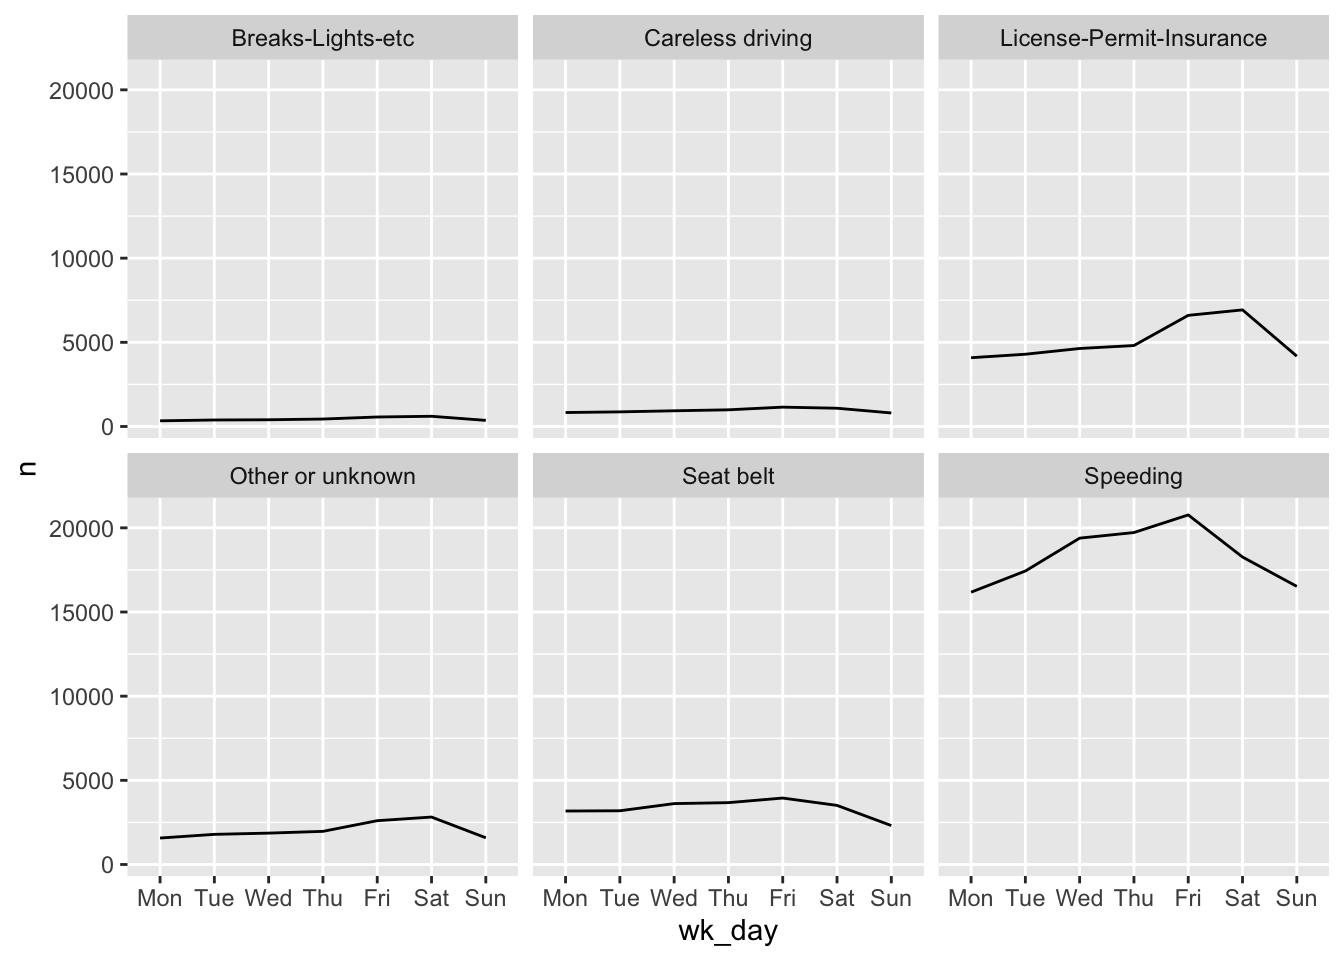 Chapter 1 Data Visualization with ggplot2 | Data